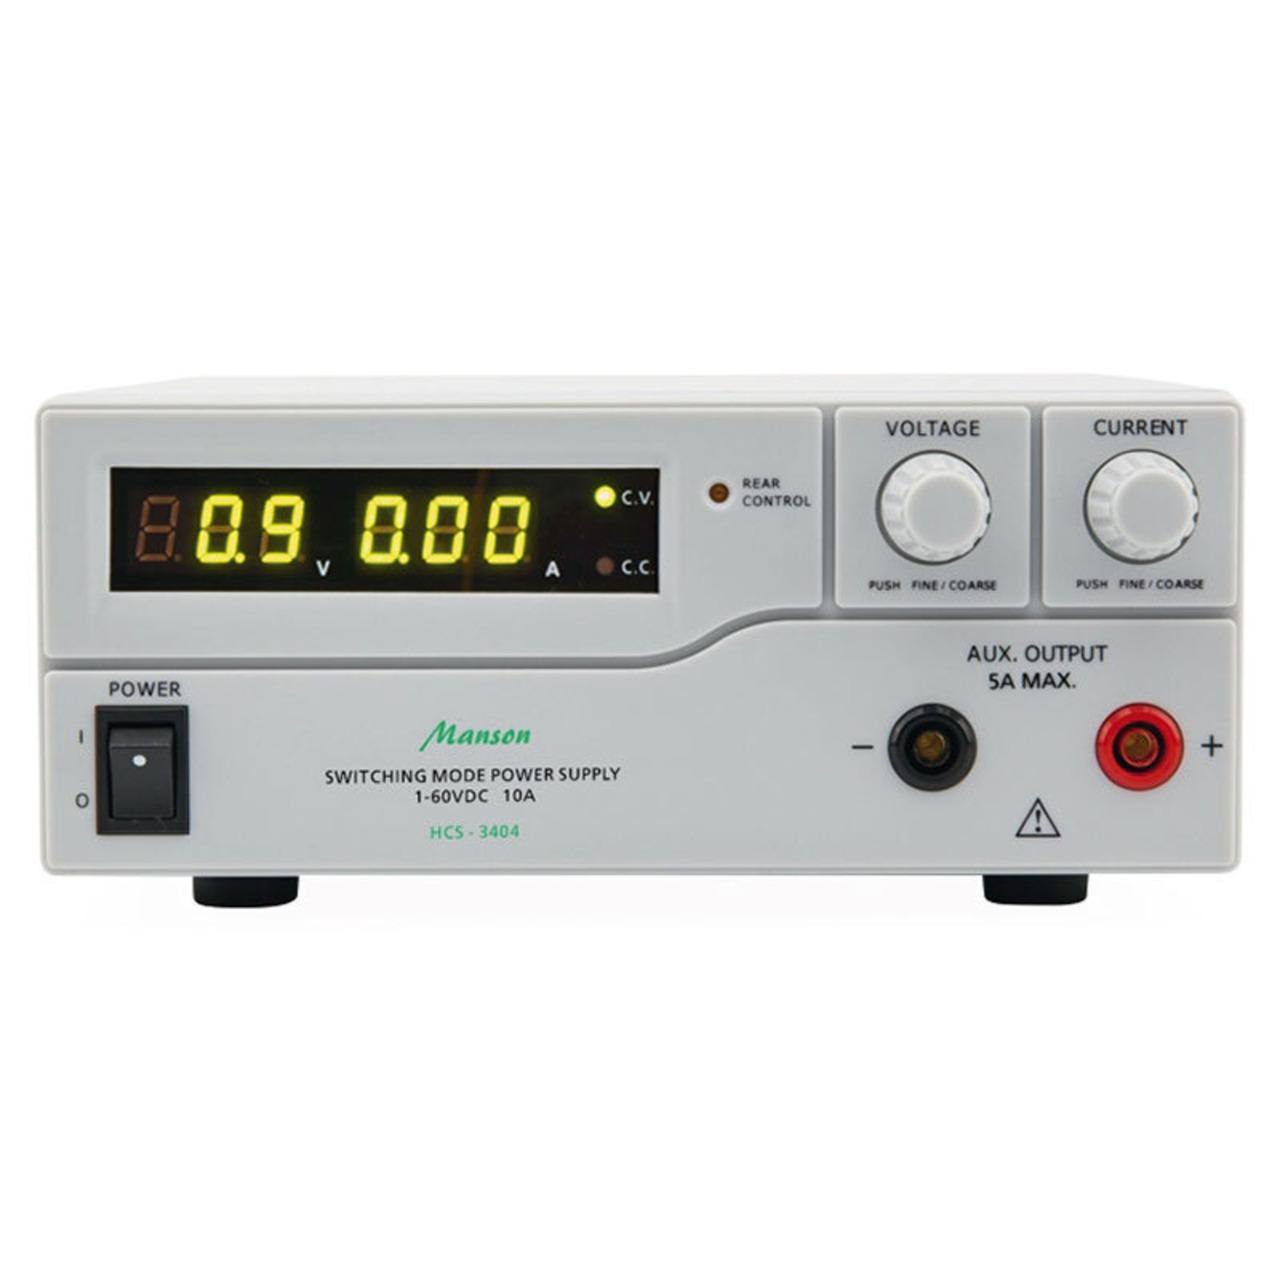 Manson Labornetzgerät HCS-3404 (1-60 V - 0-10 A)- mit USB-Schnittstelle- programmierbar